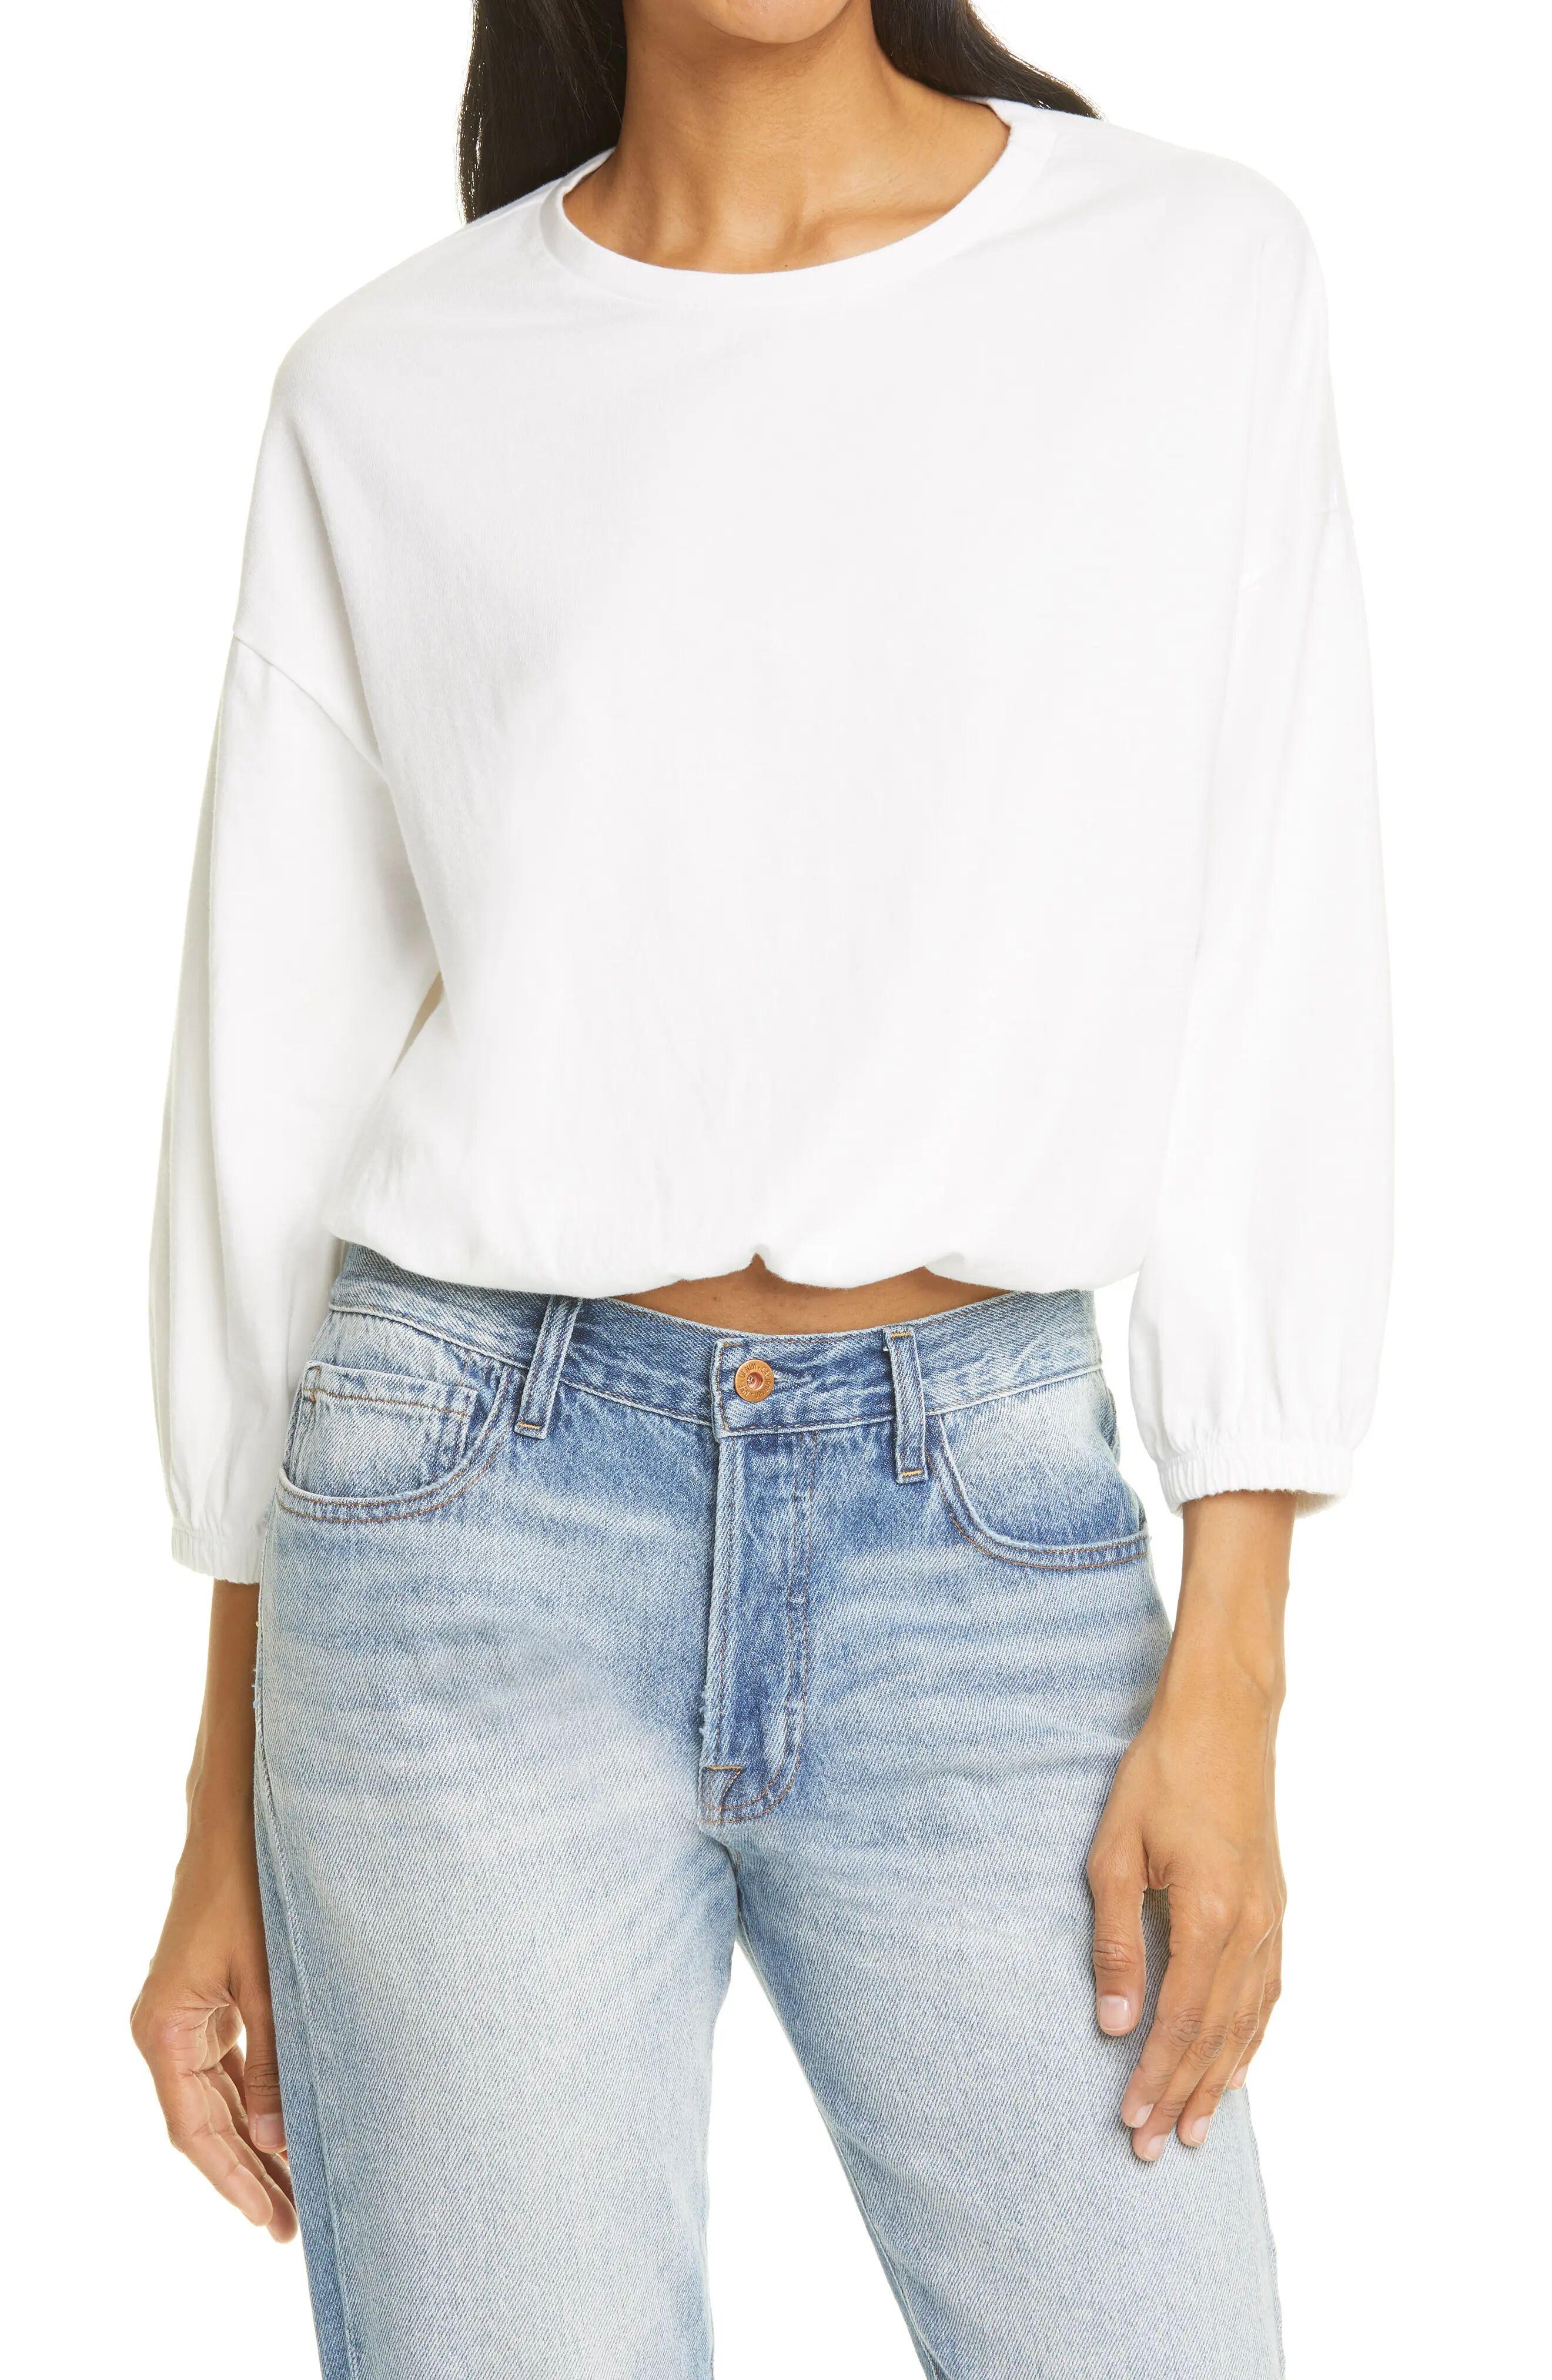 NSF Clothing Women's Nsf Clothing Annelise Shirred Bubble Sleeve Top, Size Medium - White